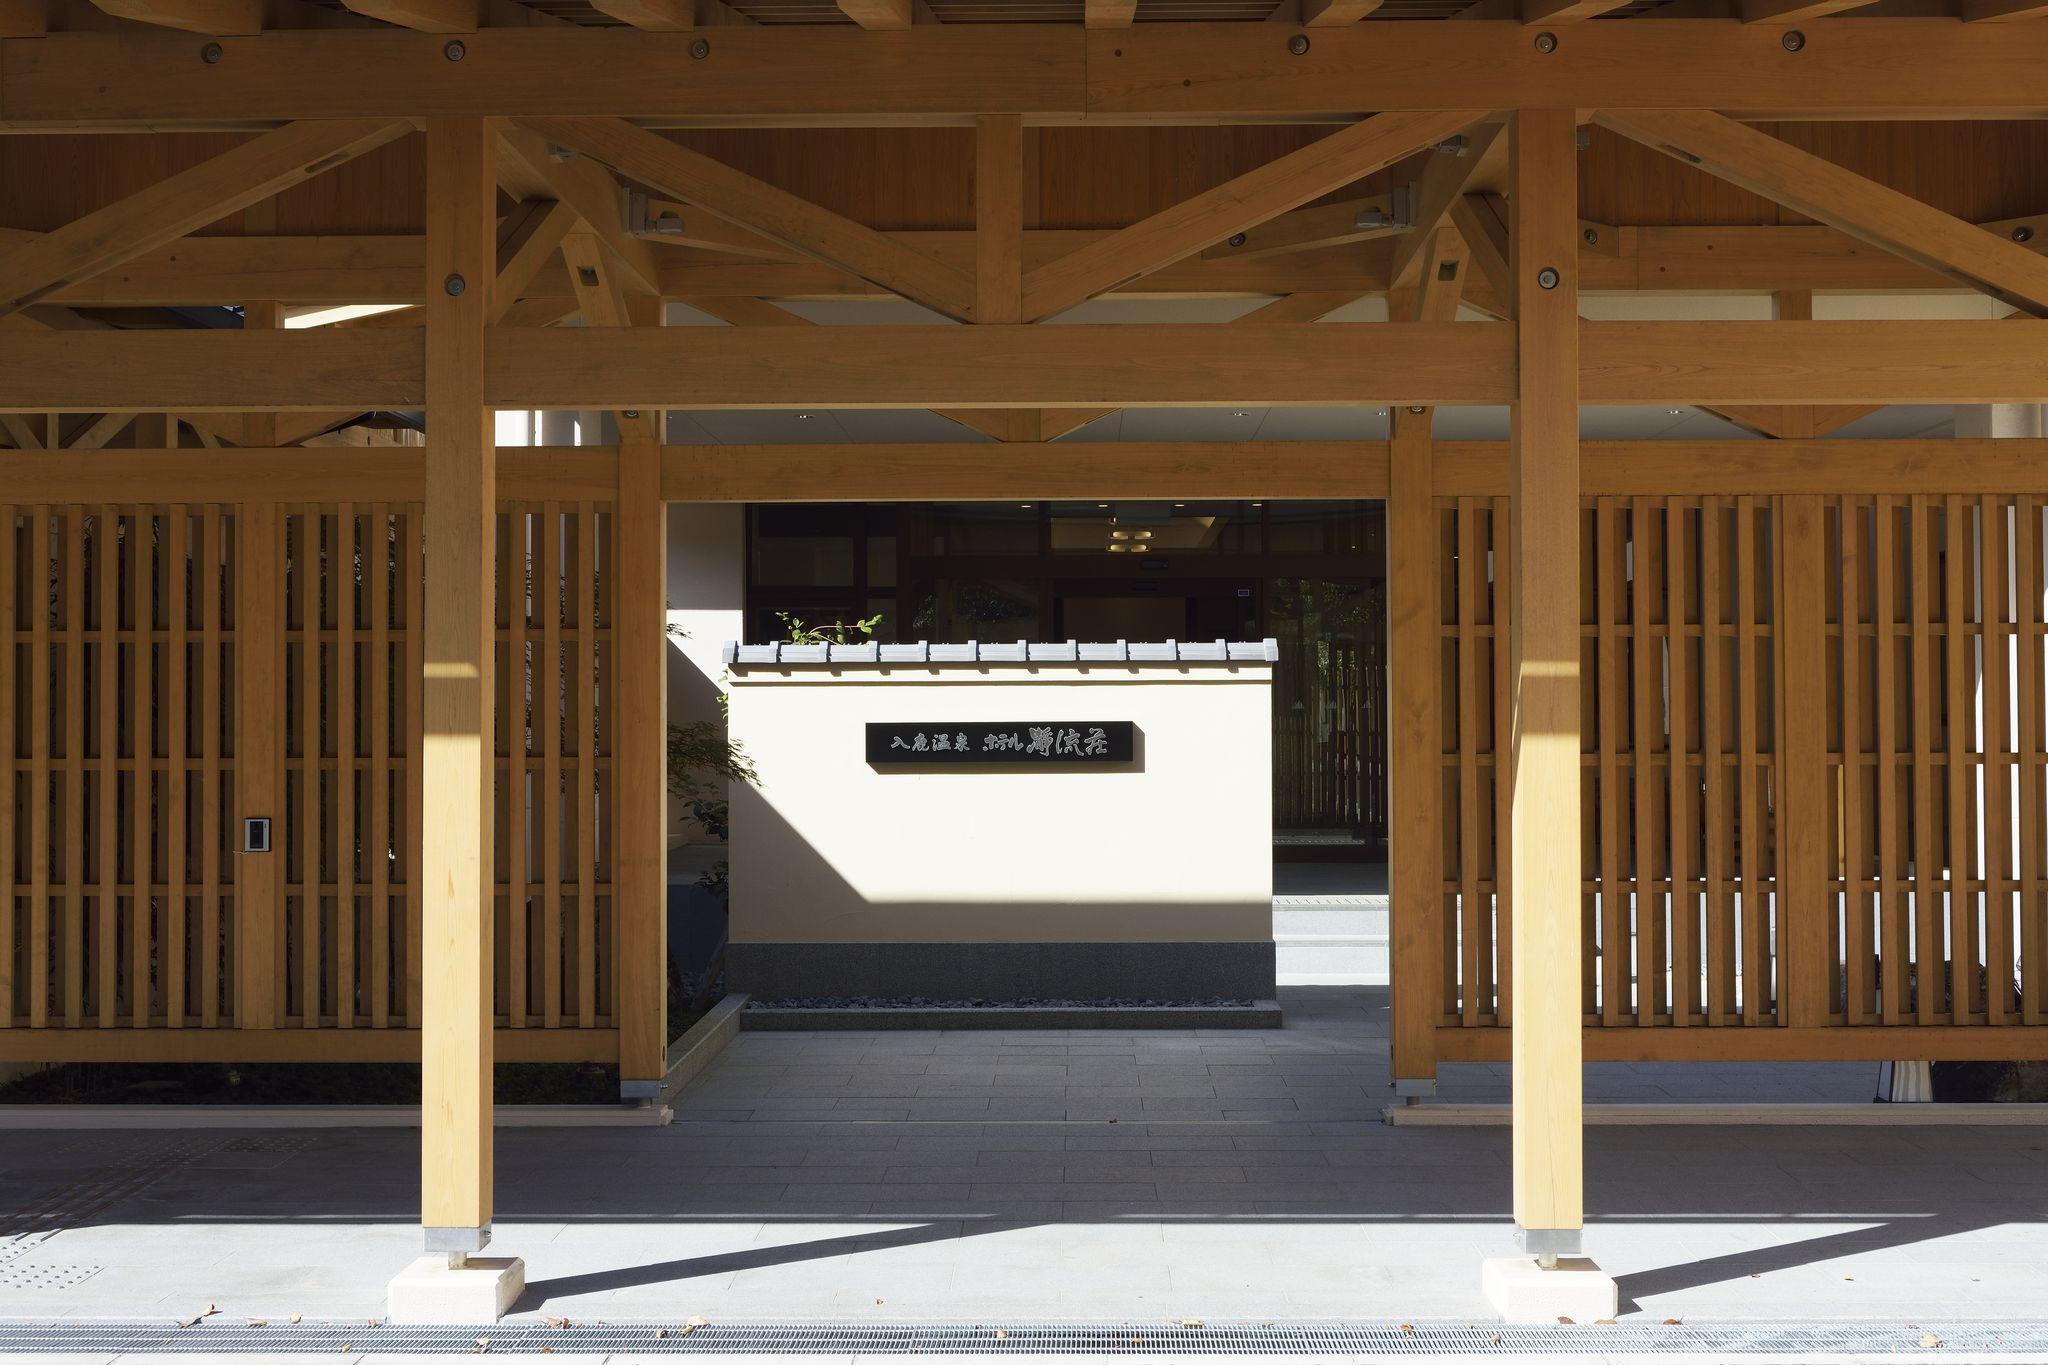 Irukaspa Hotel Seiryuso